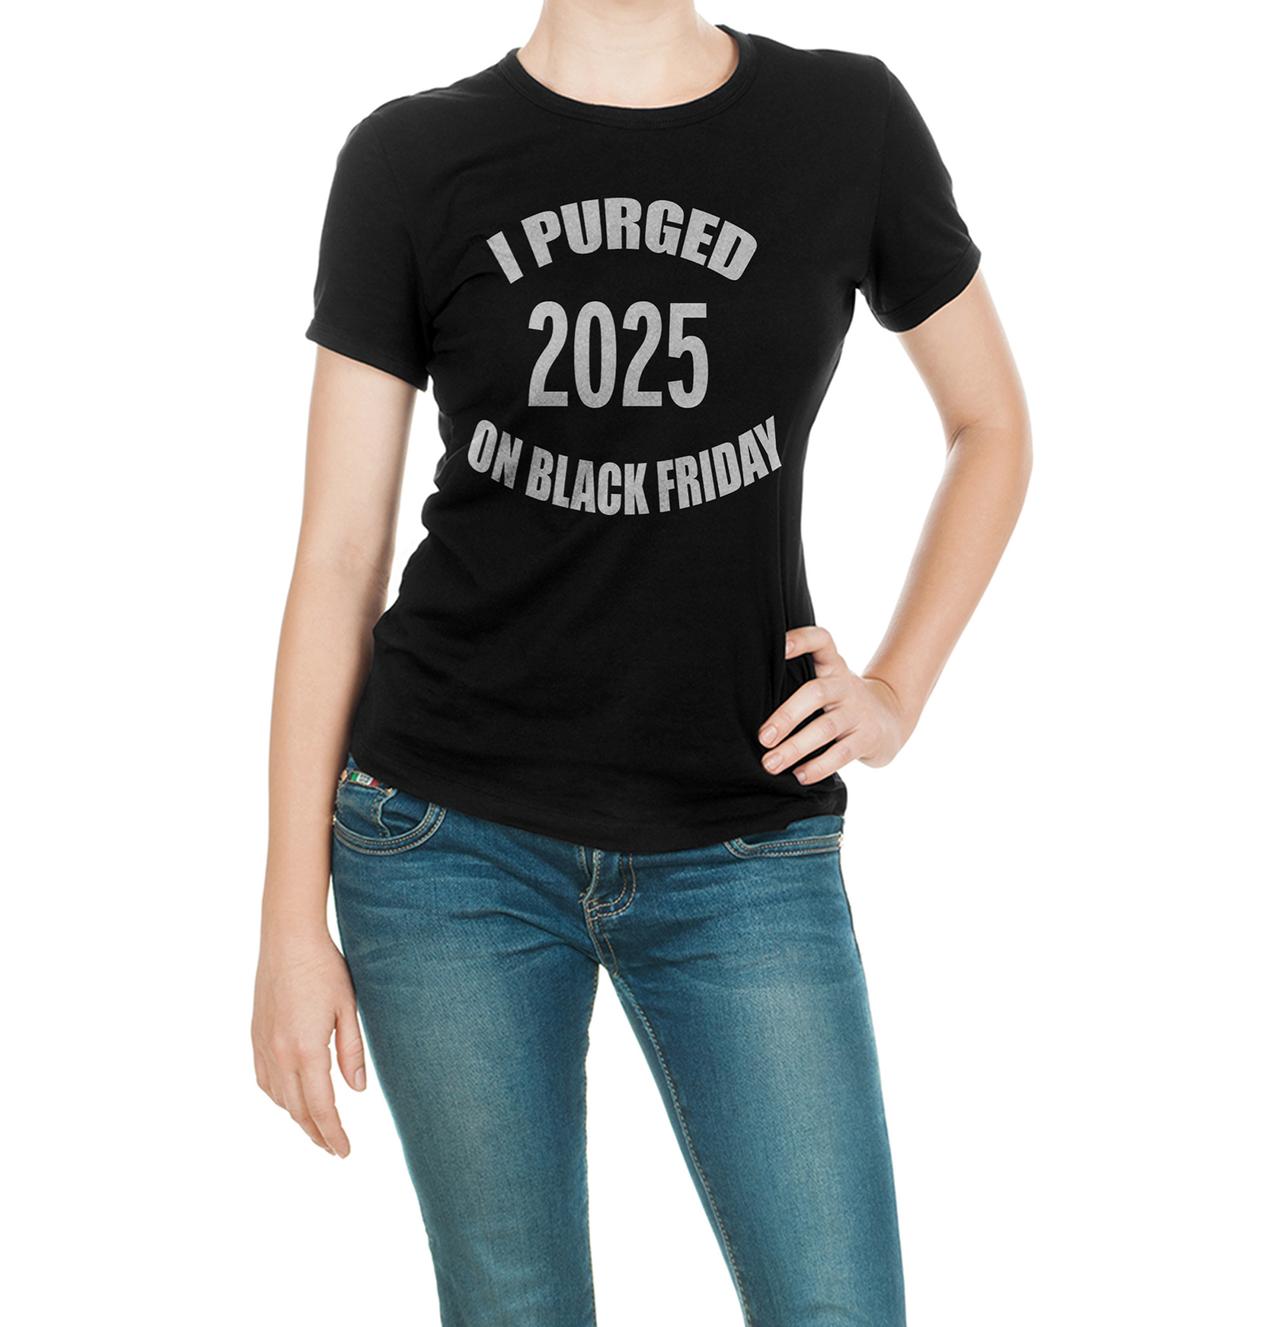 Group Shirt Designs